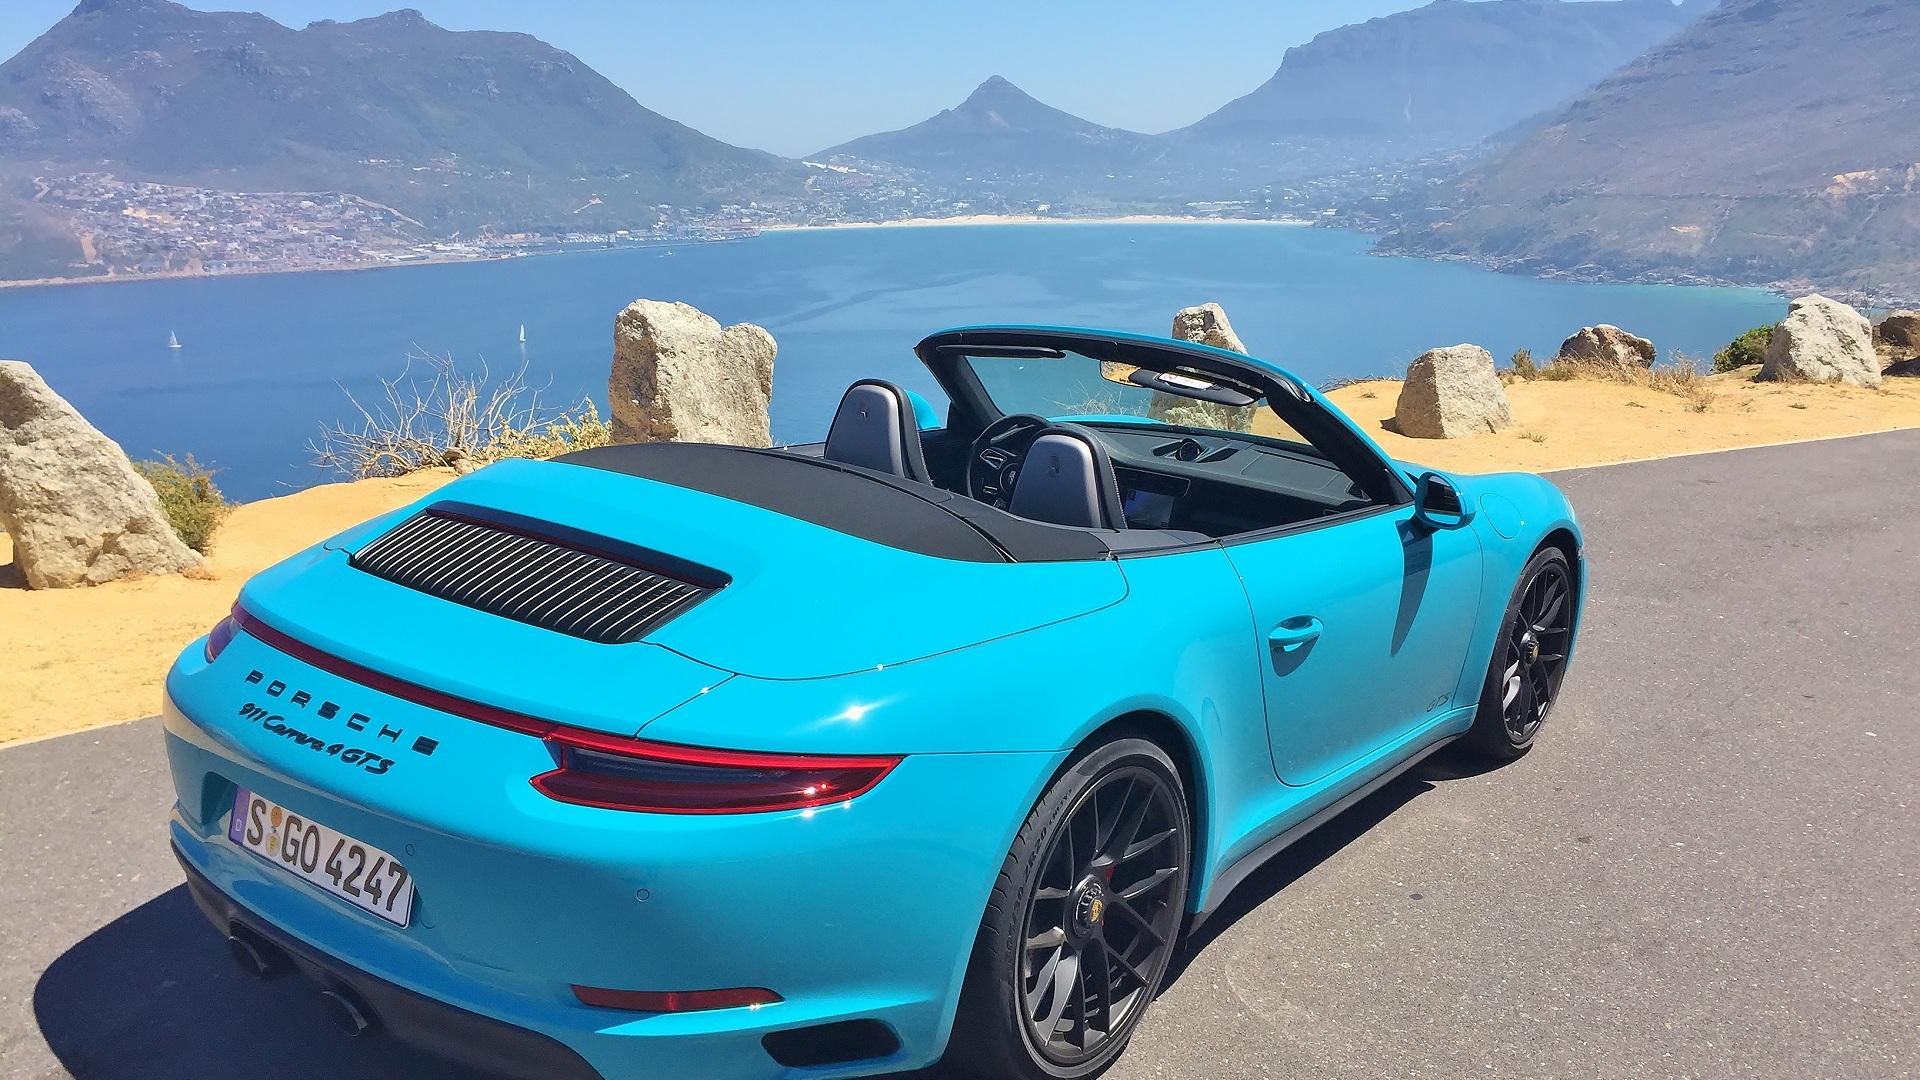 2017 Porsche 911 Carrera GTS Media Drive, Cape Town, South Africa, January 2017